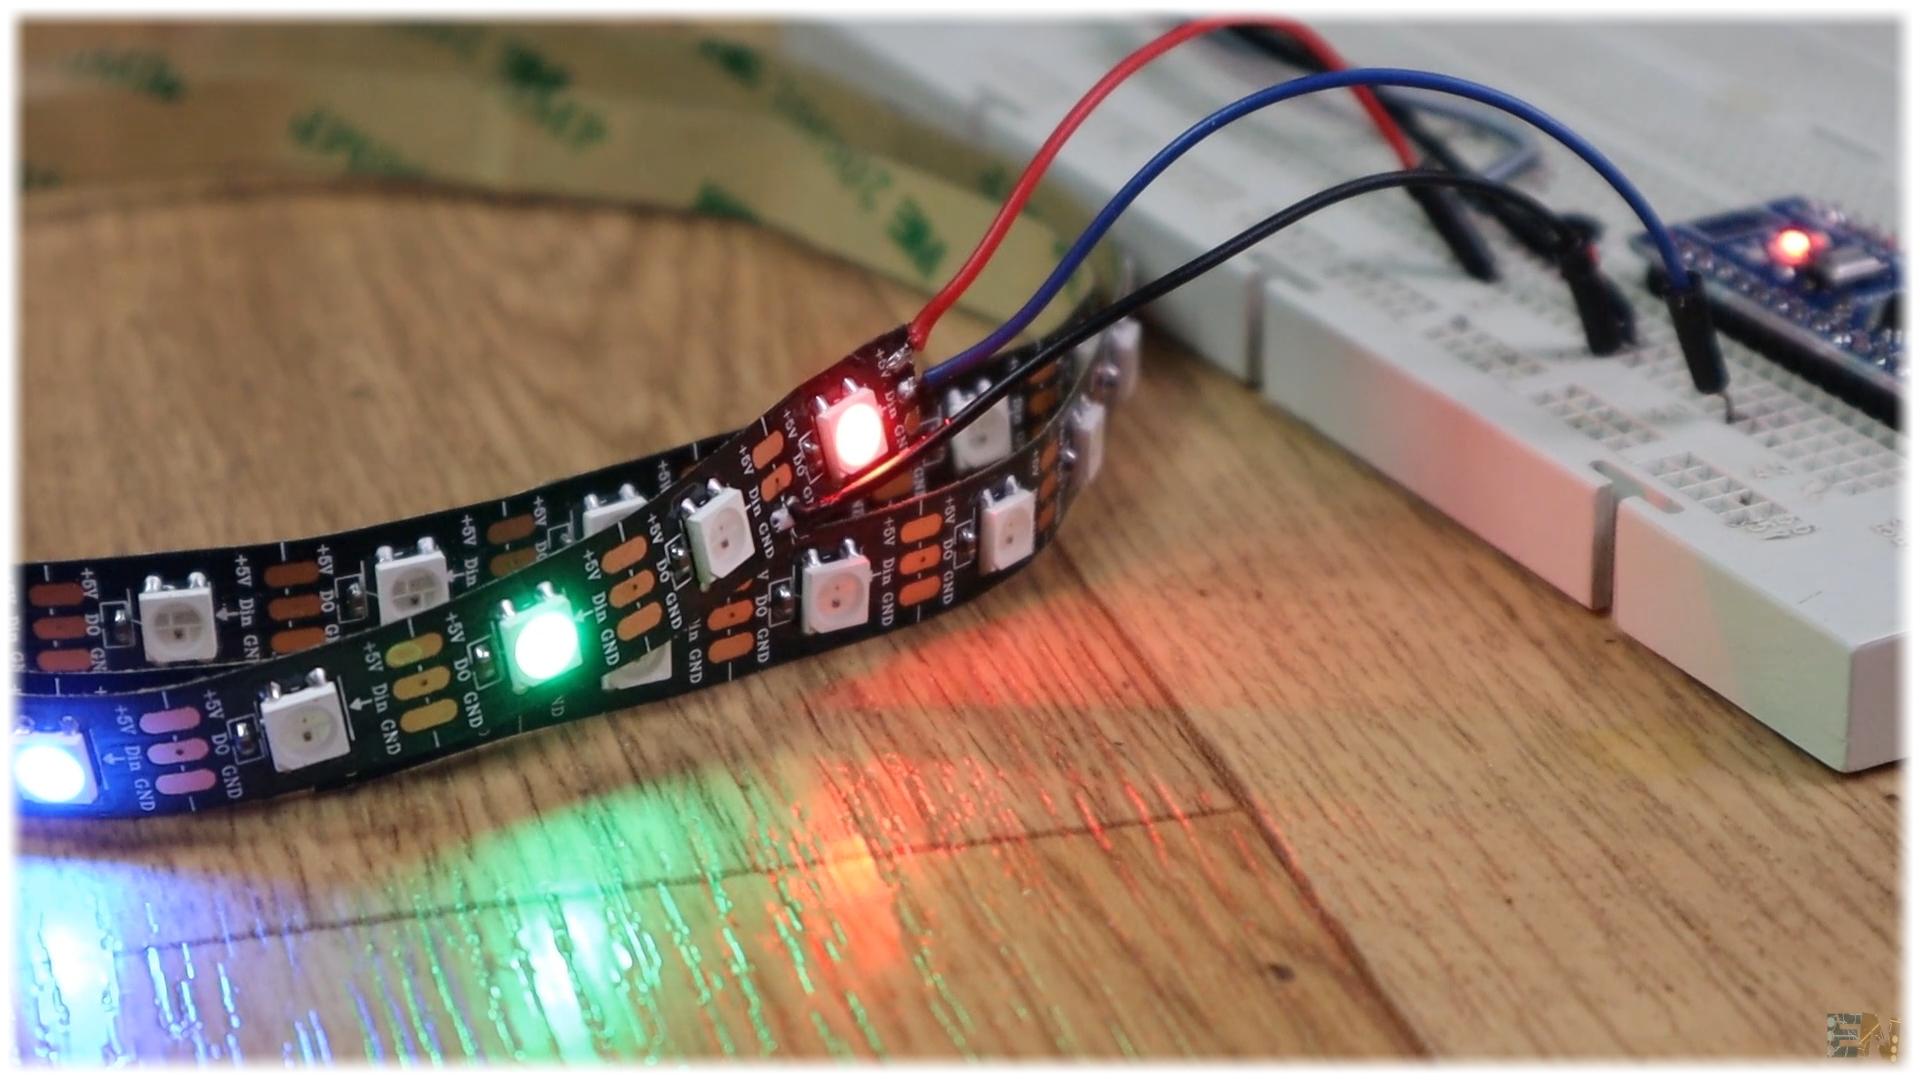 DIY Arduino AMBILIGHT adalight perismatic